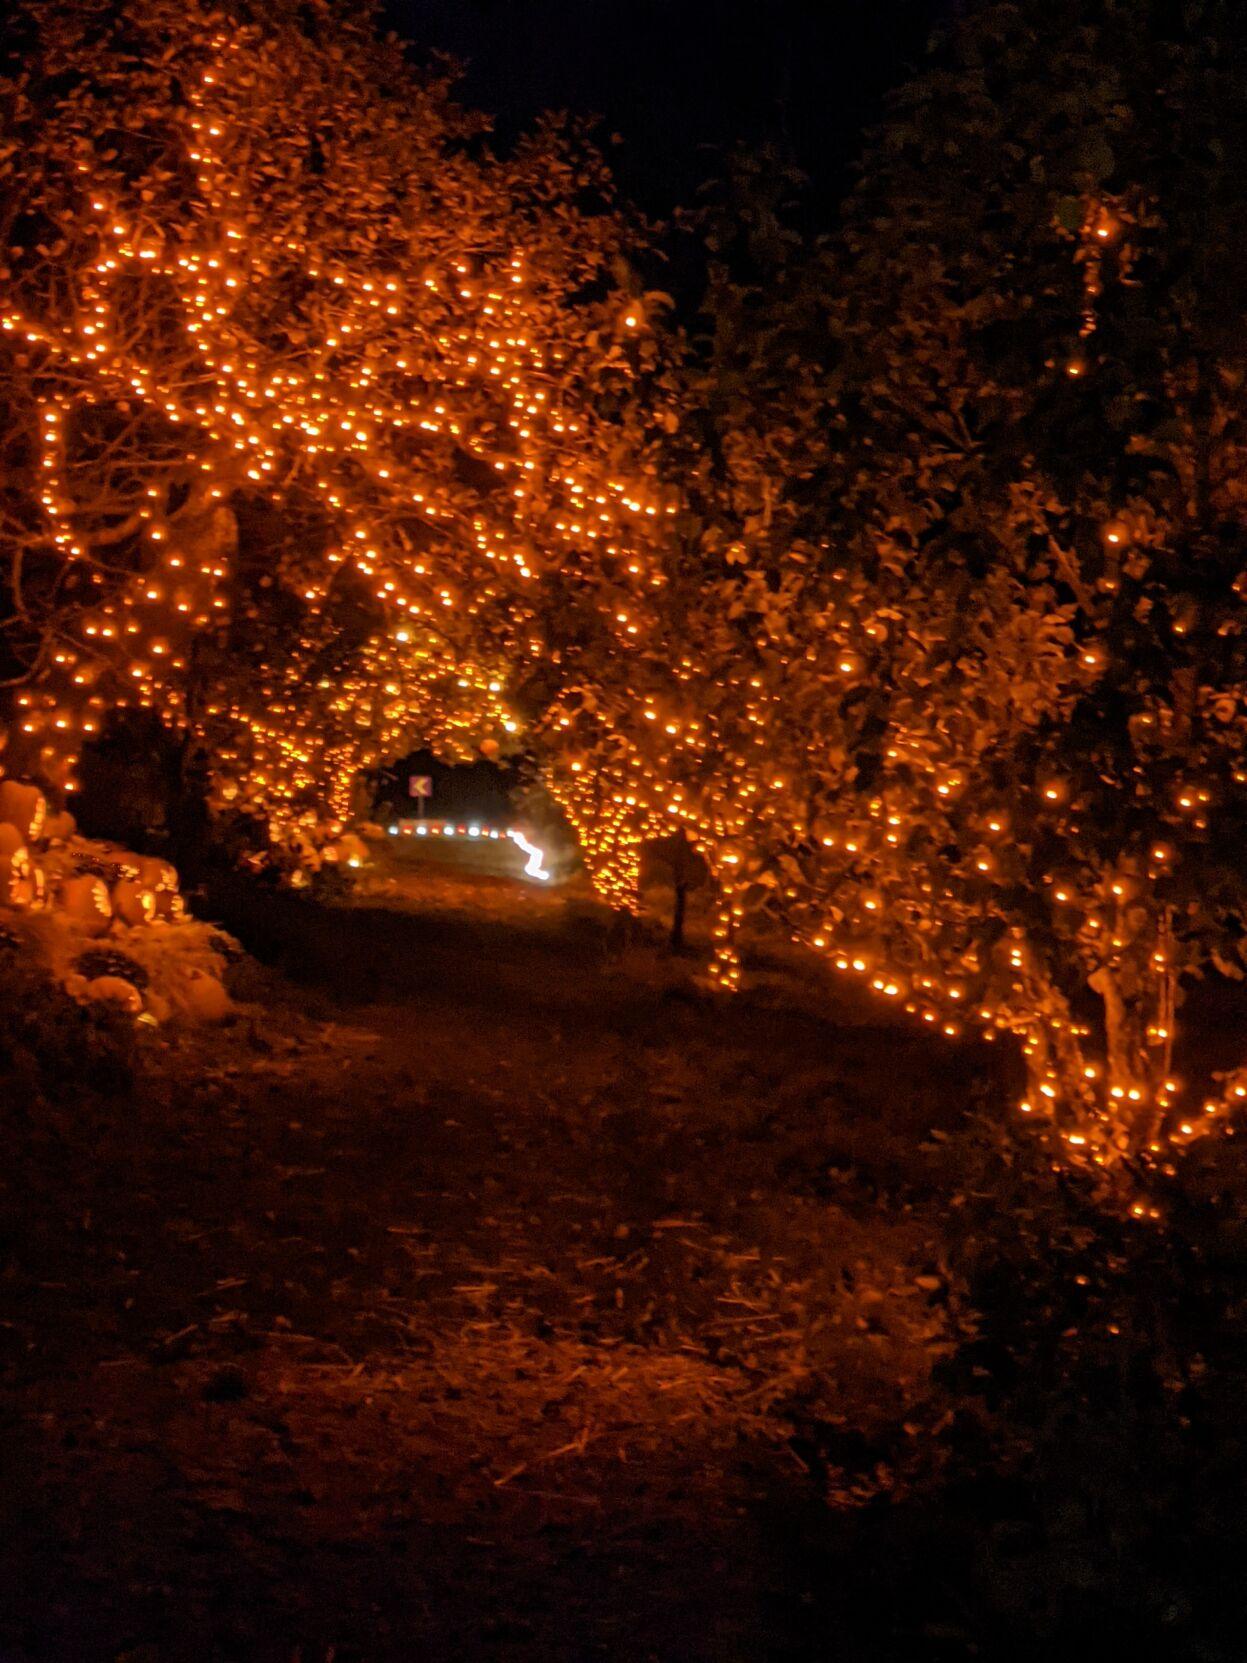 Trees lit with orange Halloween lights